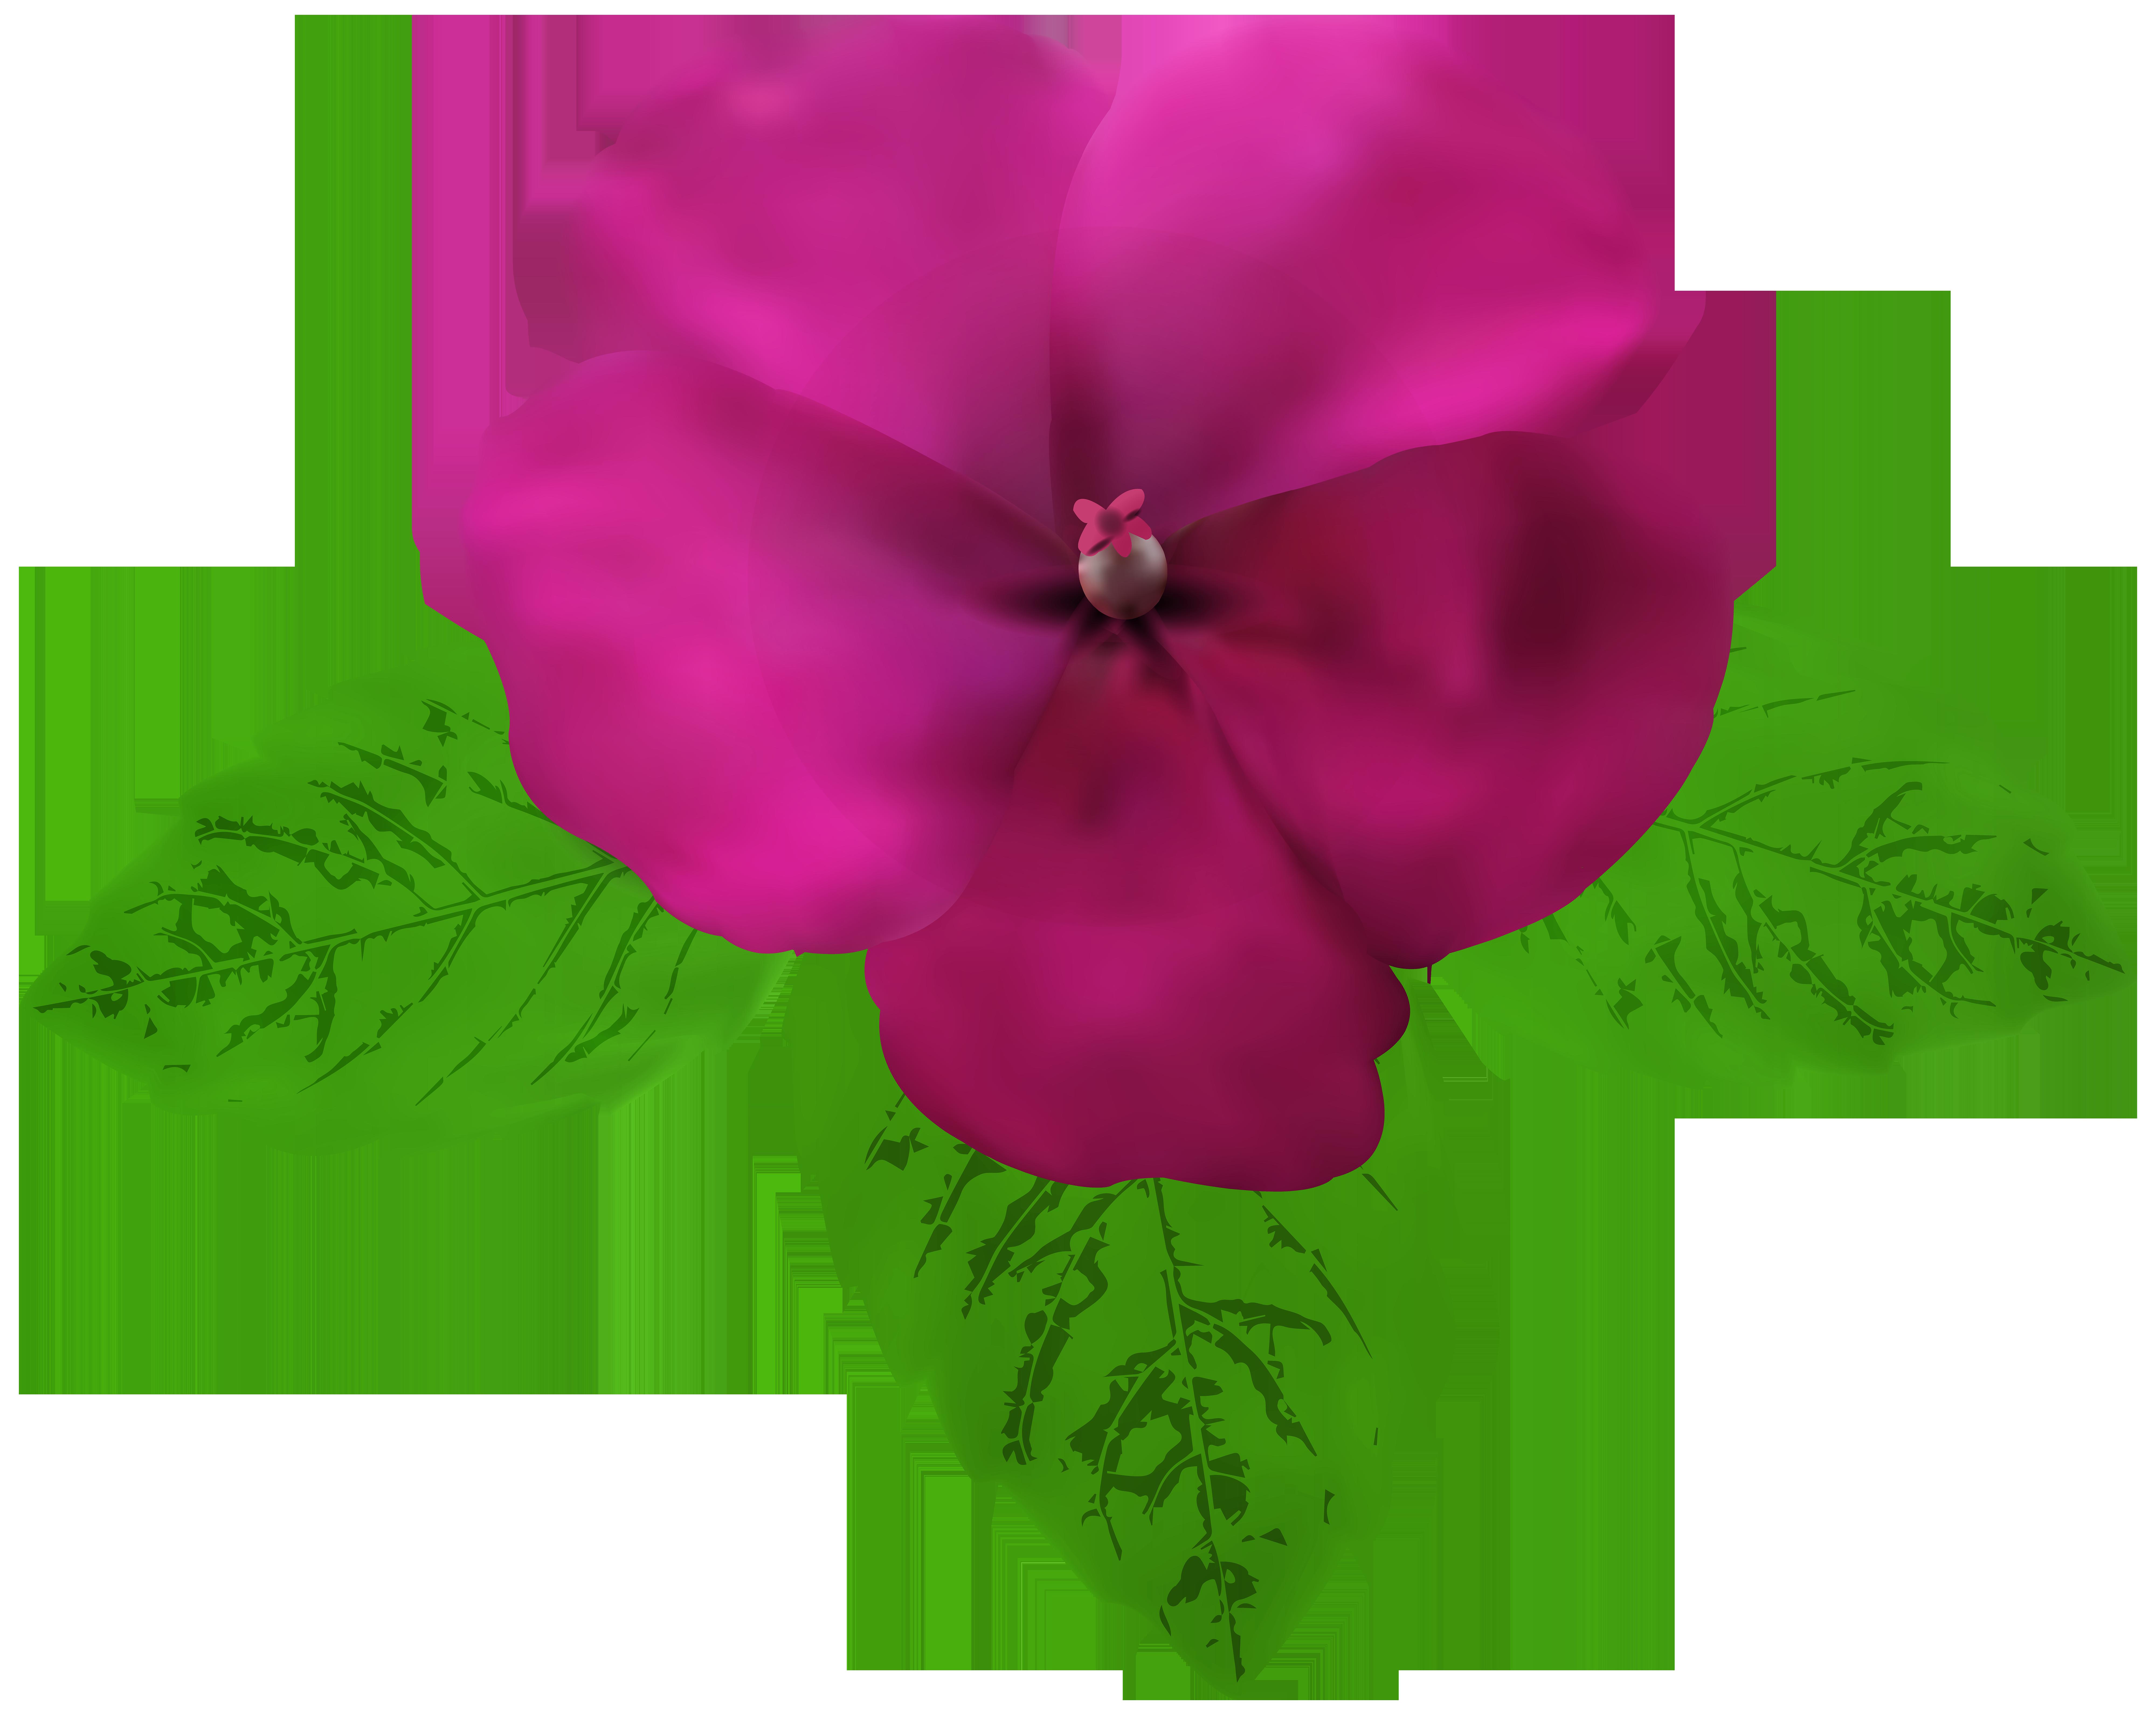 Magenta flower clipart clip art royalty free download Magenta Flower PNG Clip Art | Gallery Yopriceville - High-Quality ... clip art royalty free download